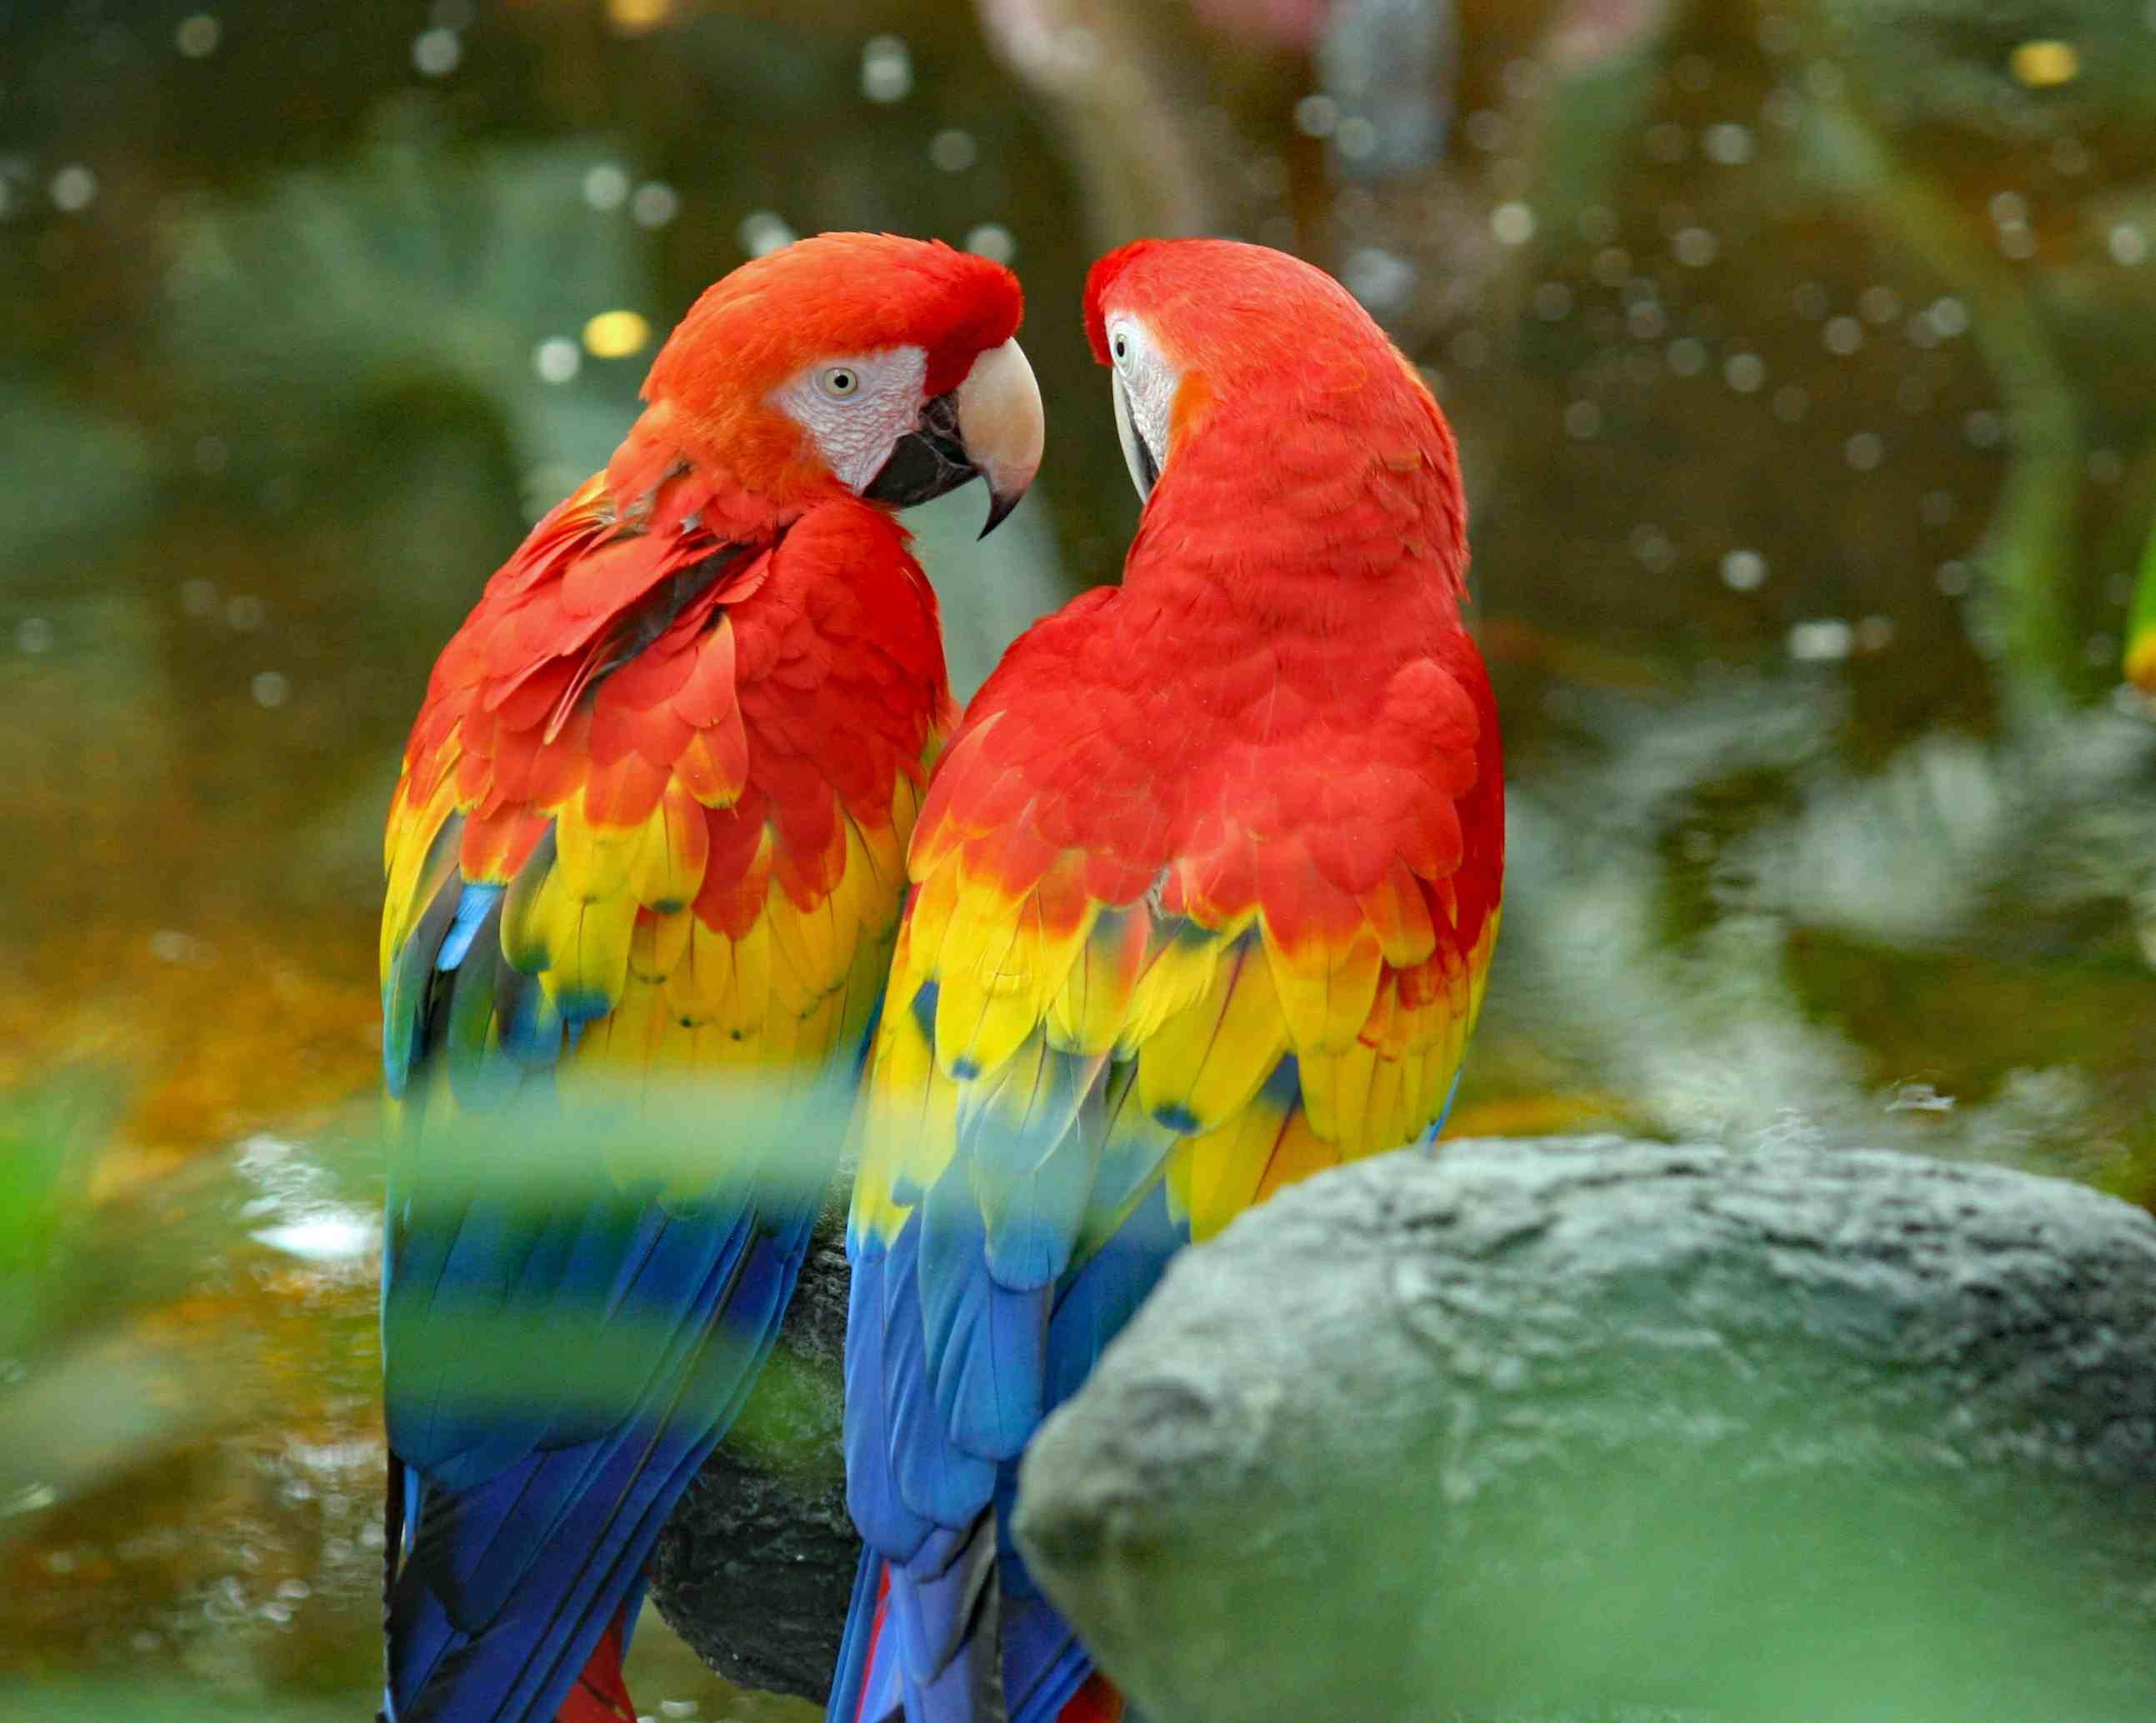 Red parrot bird photo